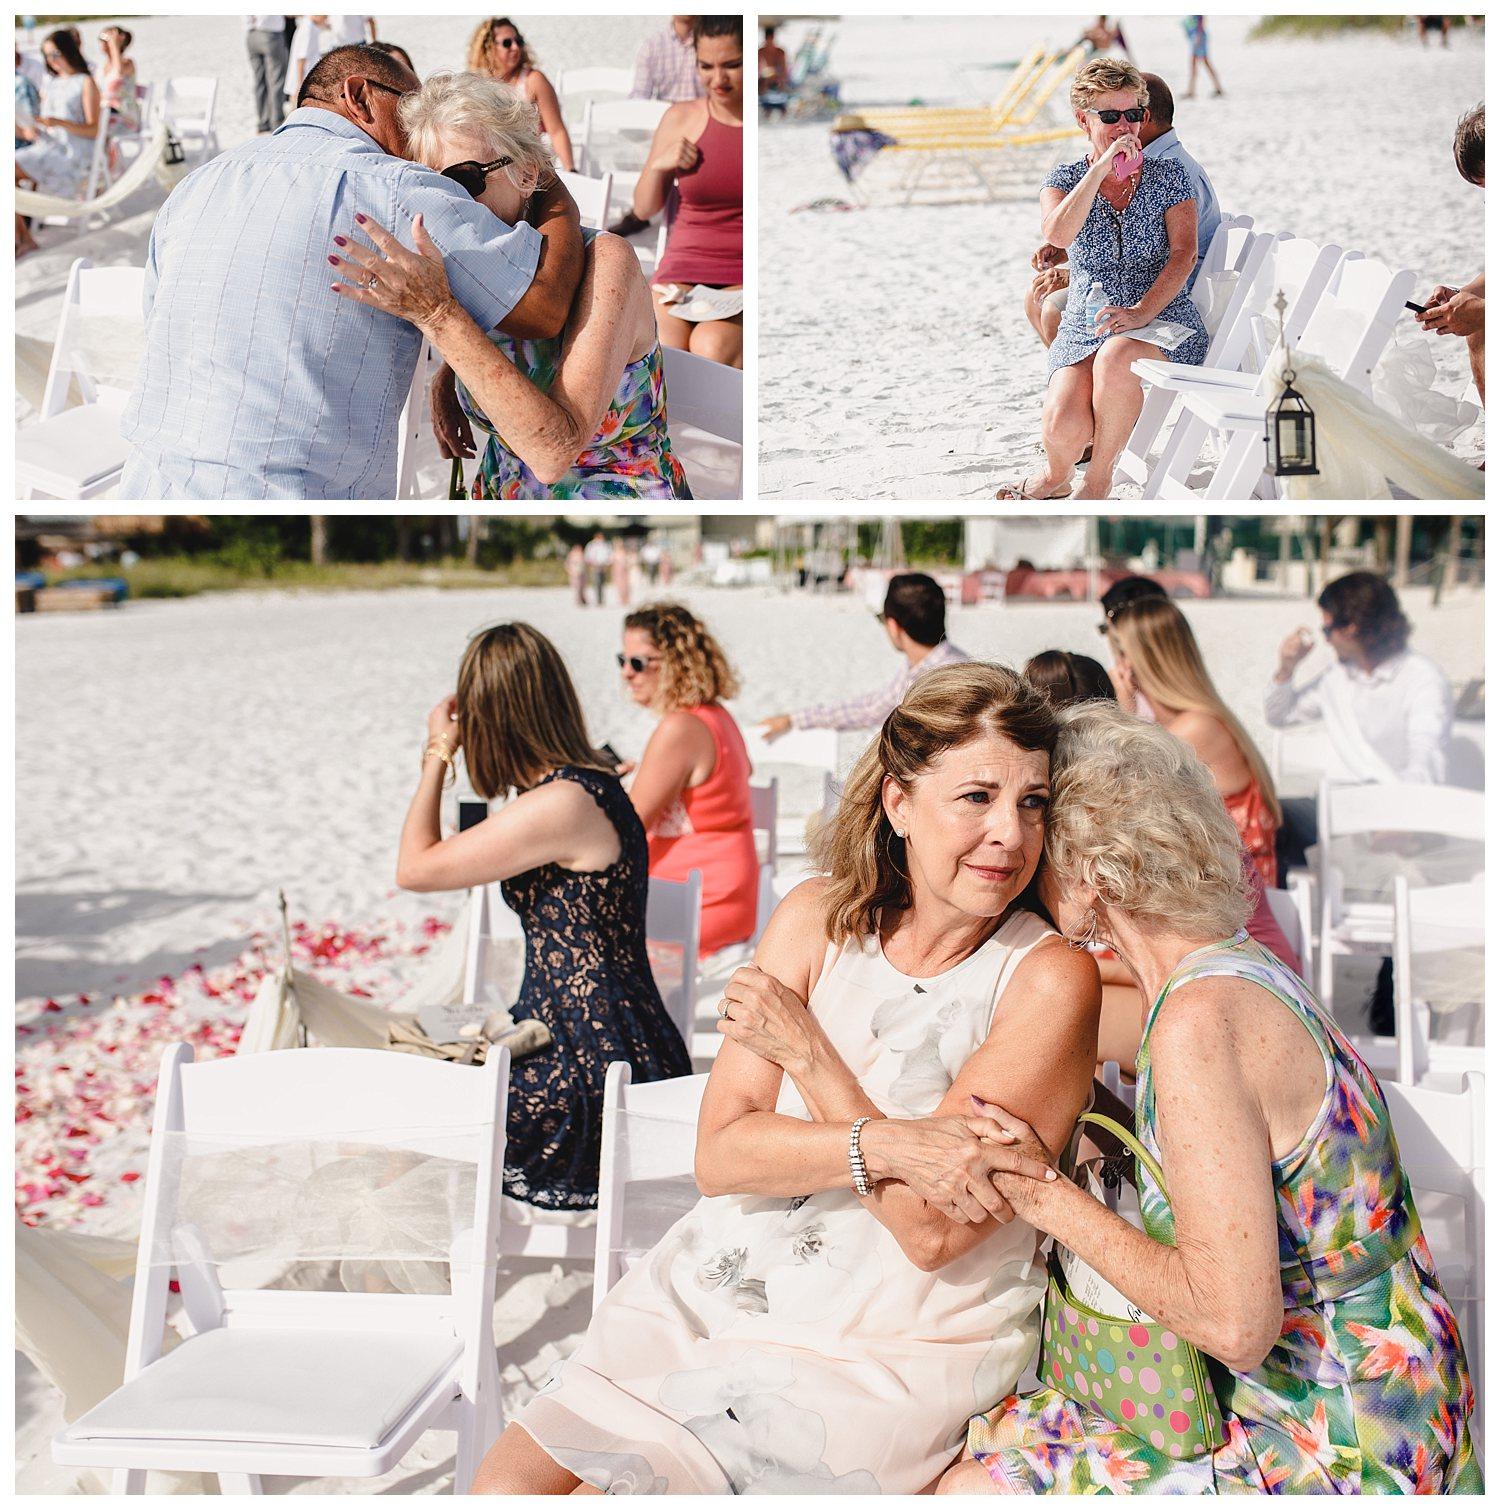 Kelsey_Diane_Photography_Destination_Wedding_Sarasota_Florida_Beach_Wedding_Alex_Austin_0645.jpg